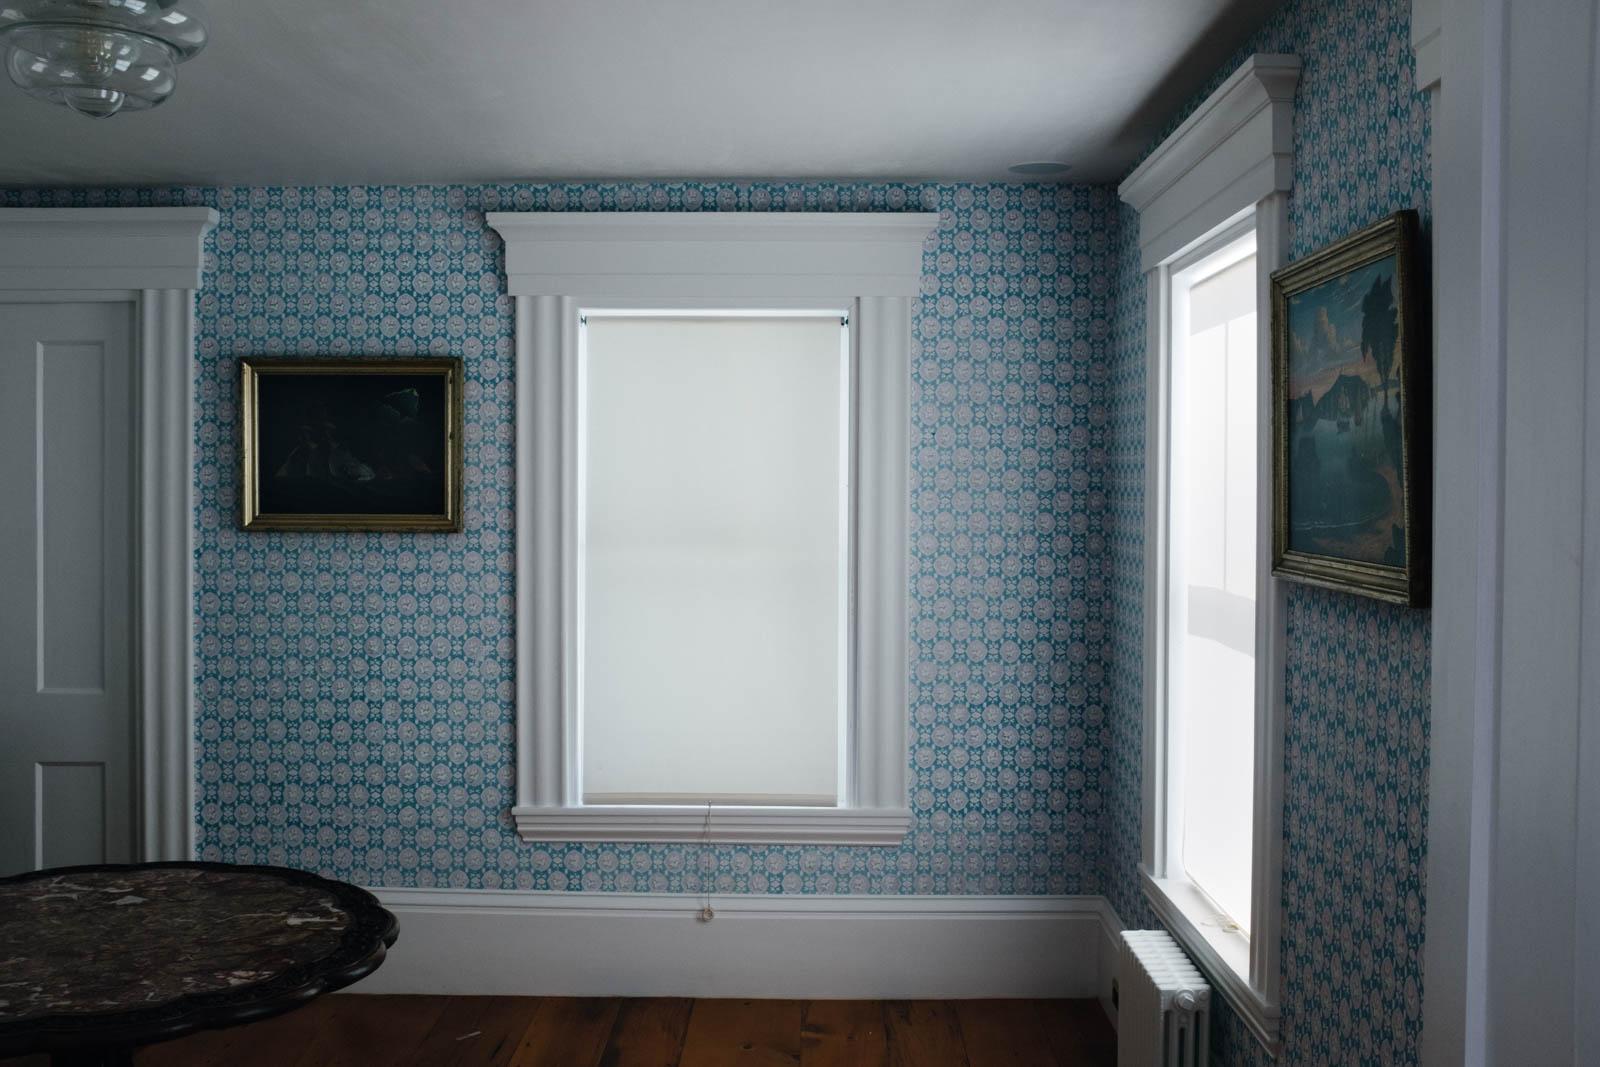 23 Jim_Wallpaper_DS Front Room-2DSCF3361-min.jpg